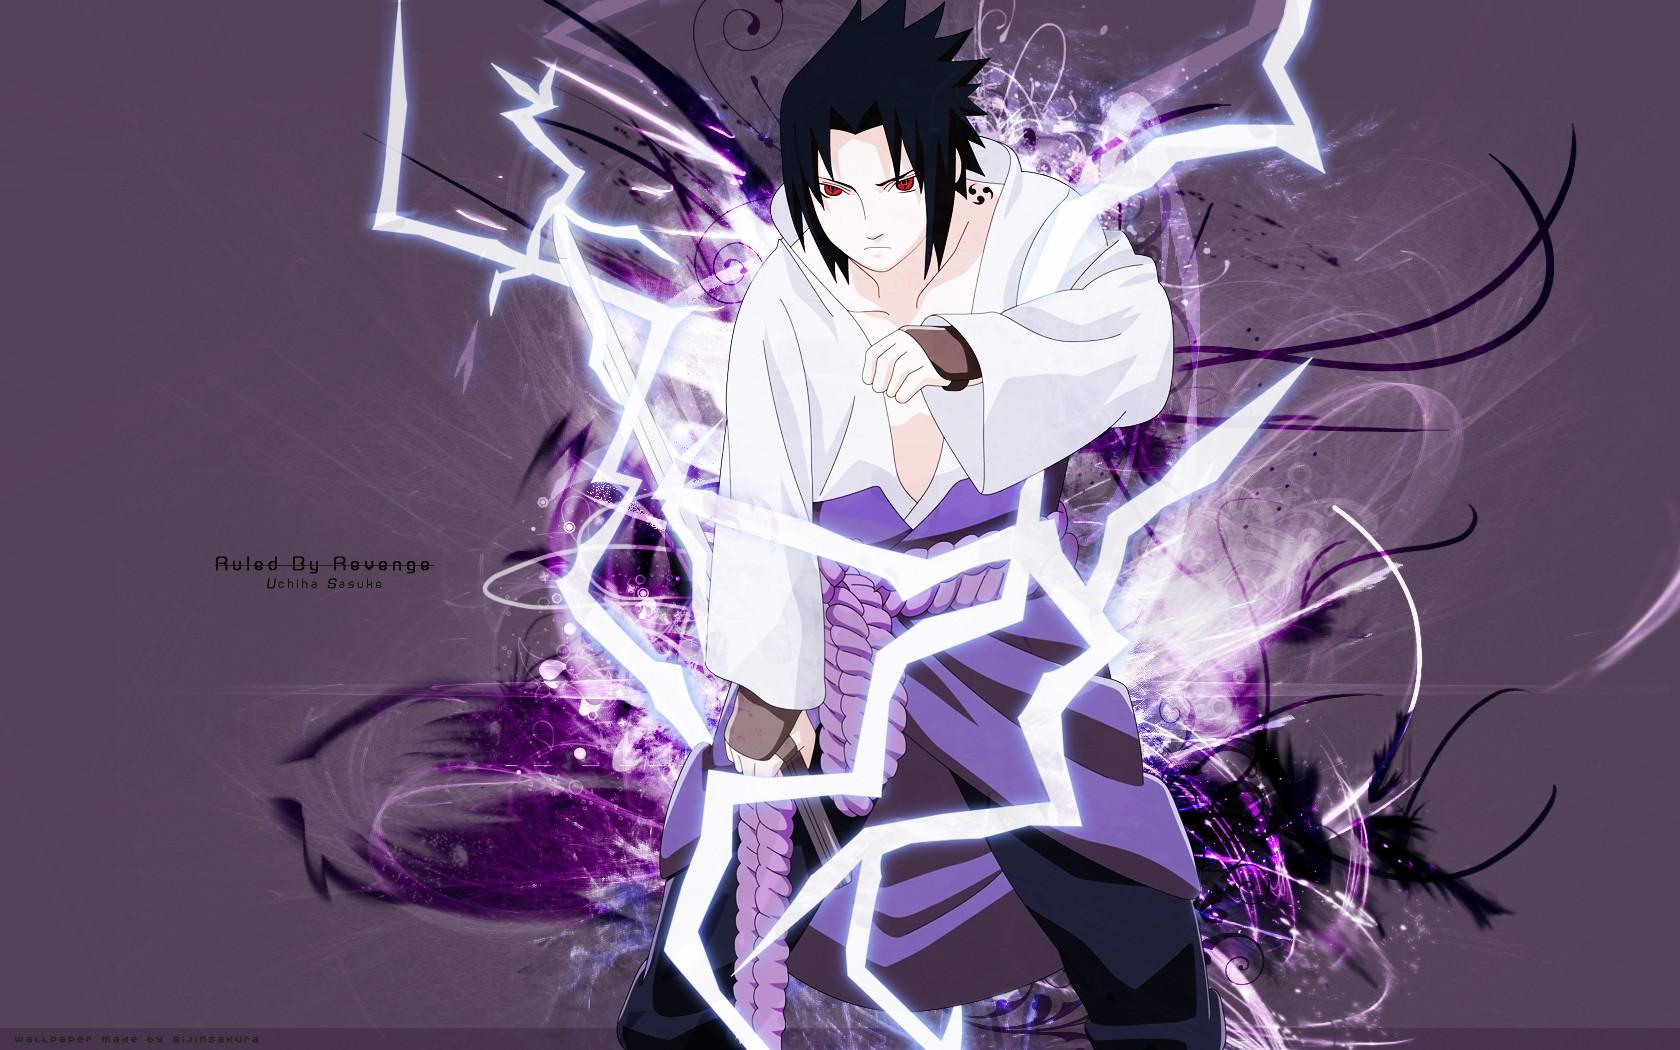 Popular Wallpaper Naruto Purple - illustration-anime-purple-Naruto-Shippuuden-Uchiha-Sasuke-machine-screenshot-mecha-computer-wallpaper-mangaka-95709  You Should Have_545395.jpg